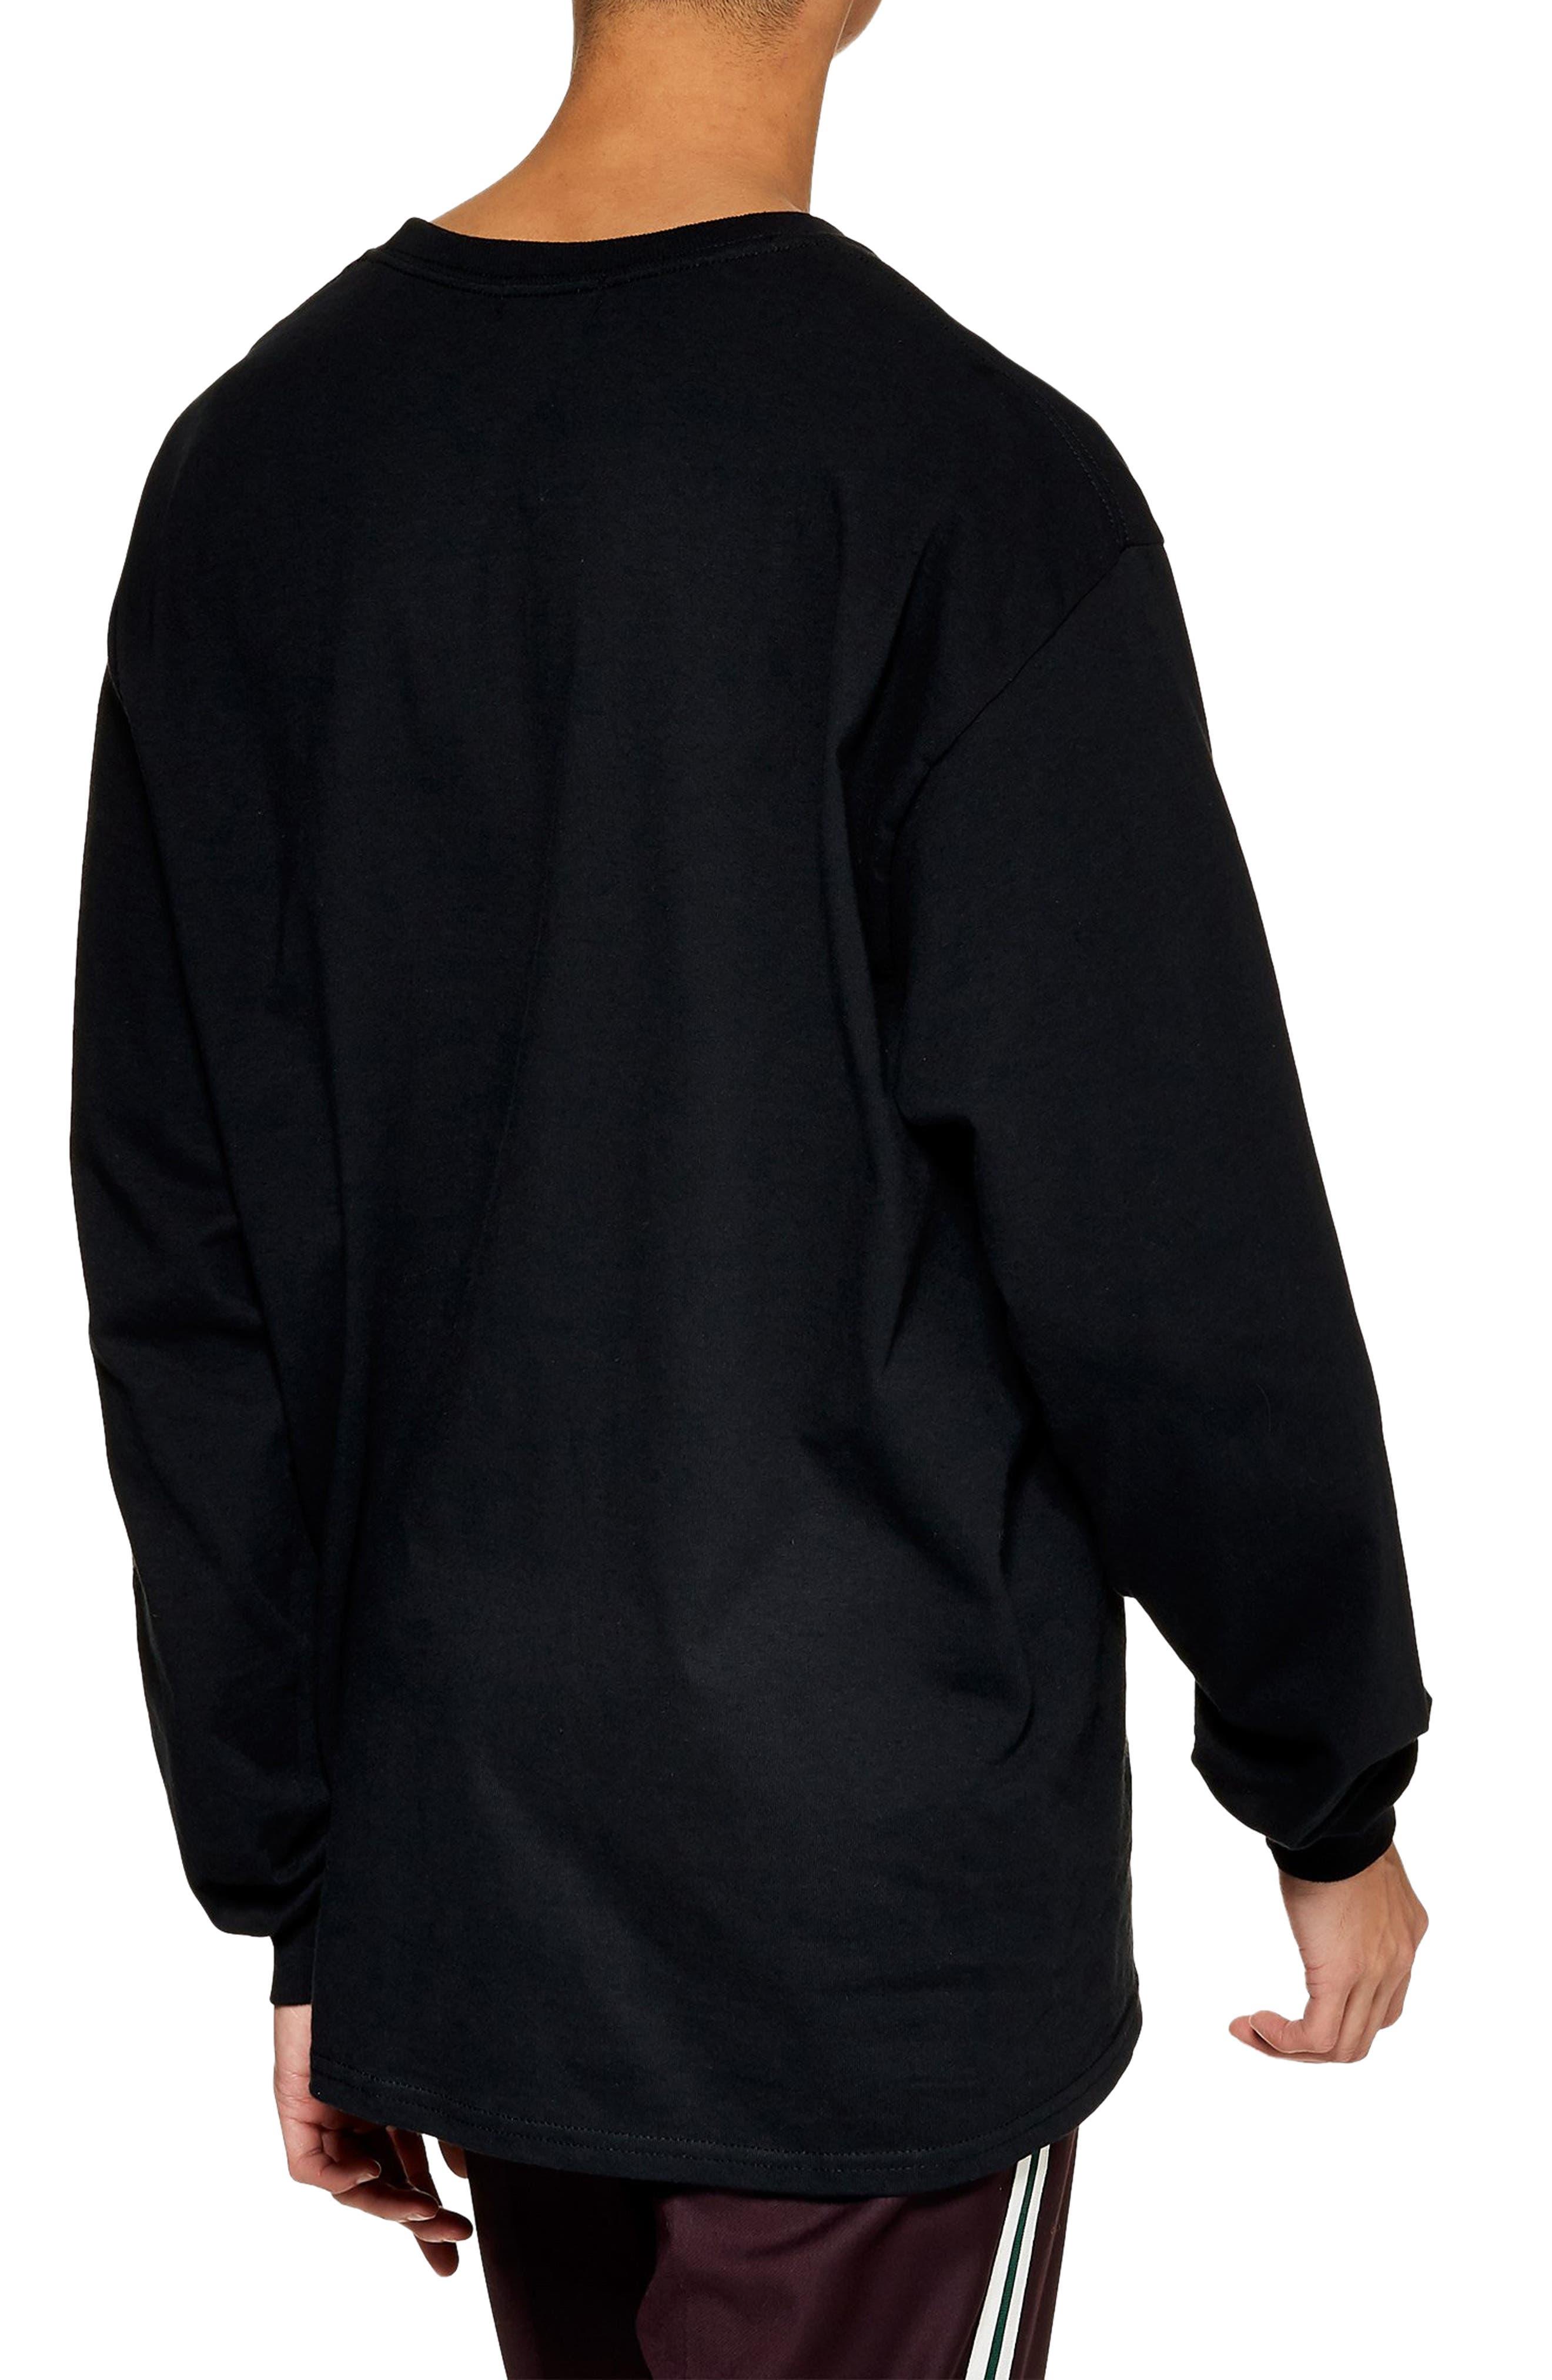 Topman Lost Graphic Long Sleeve T-Shirt, Black